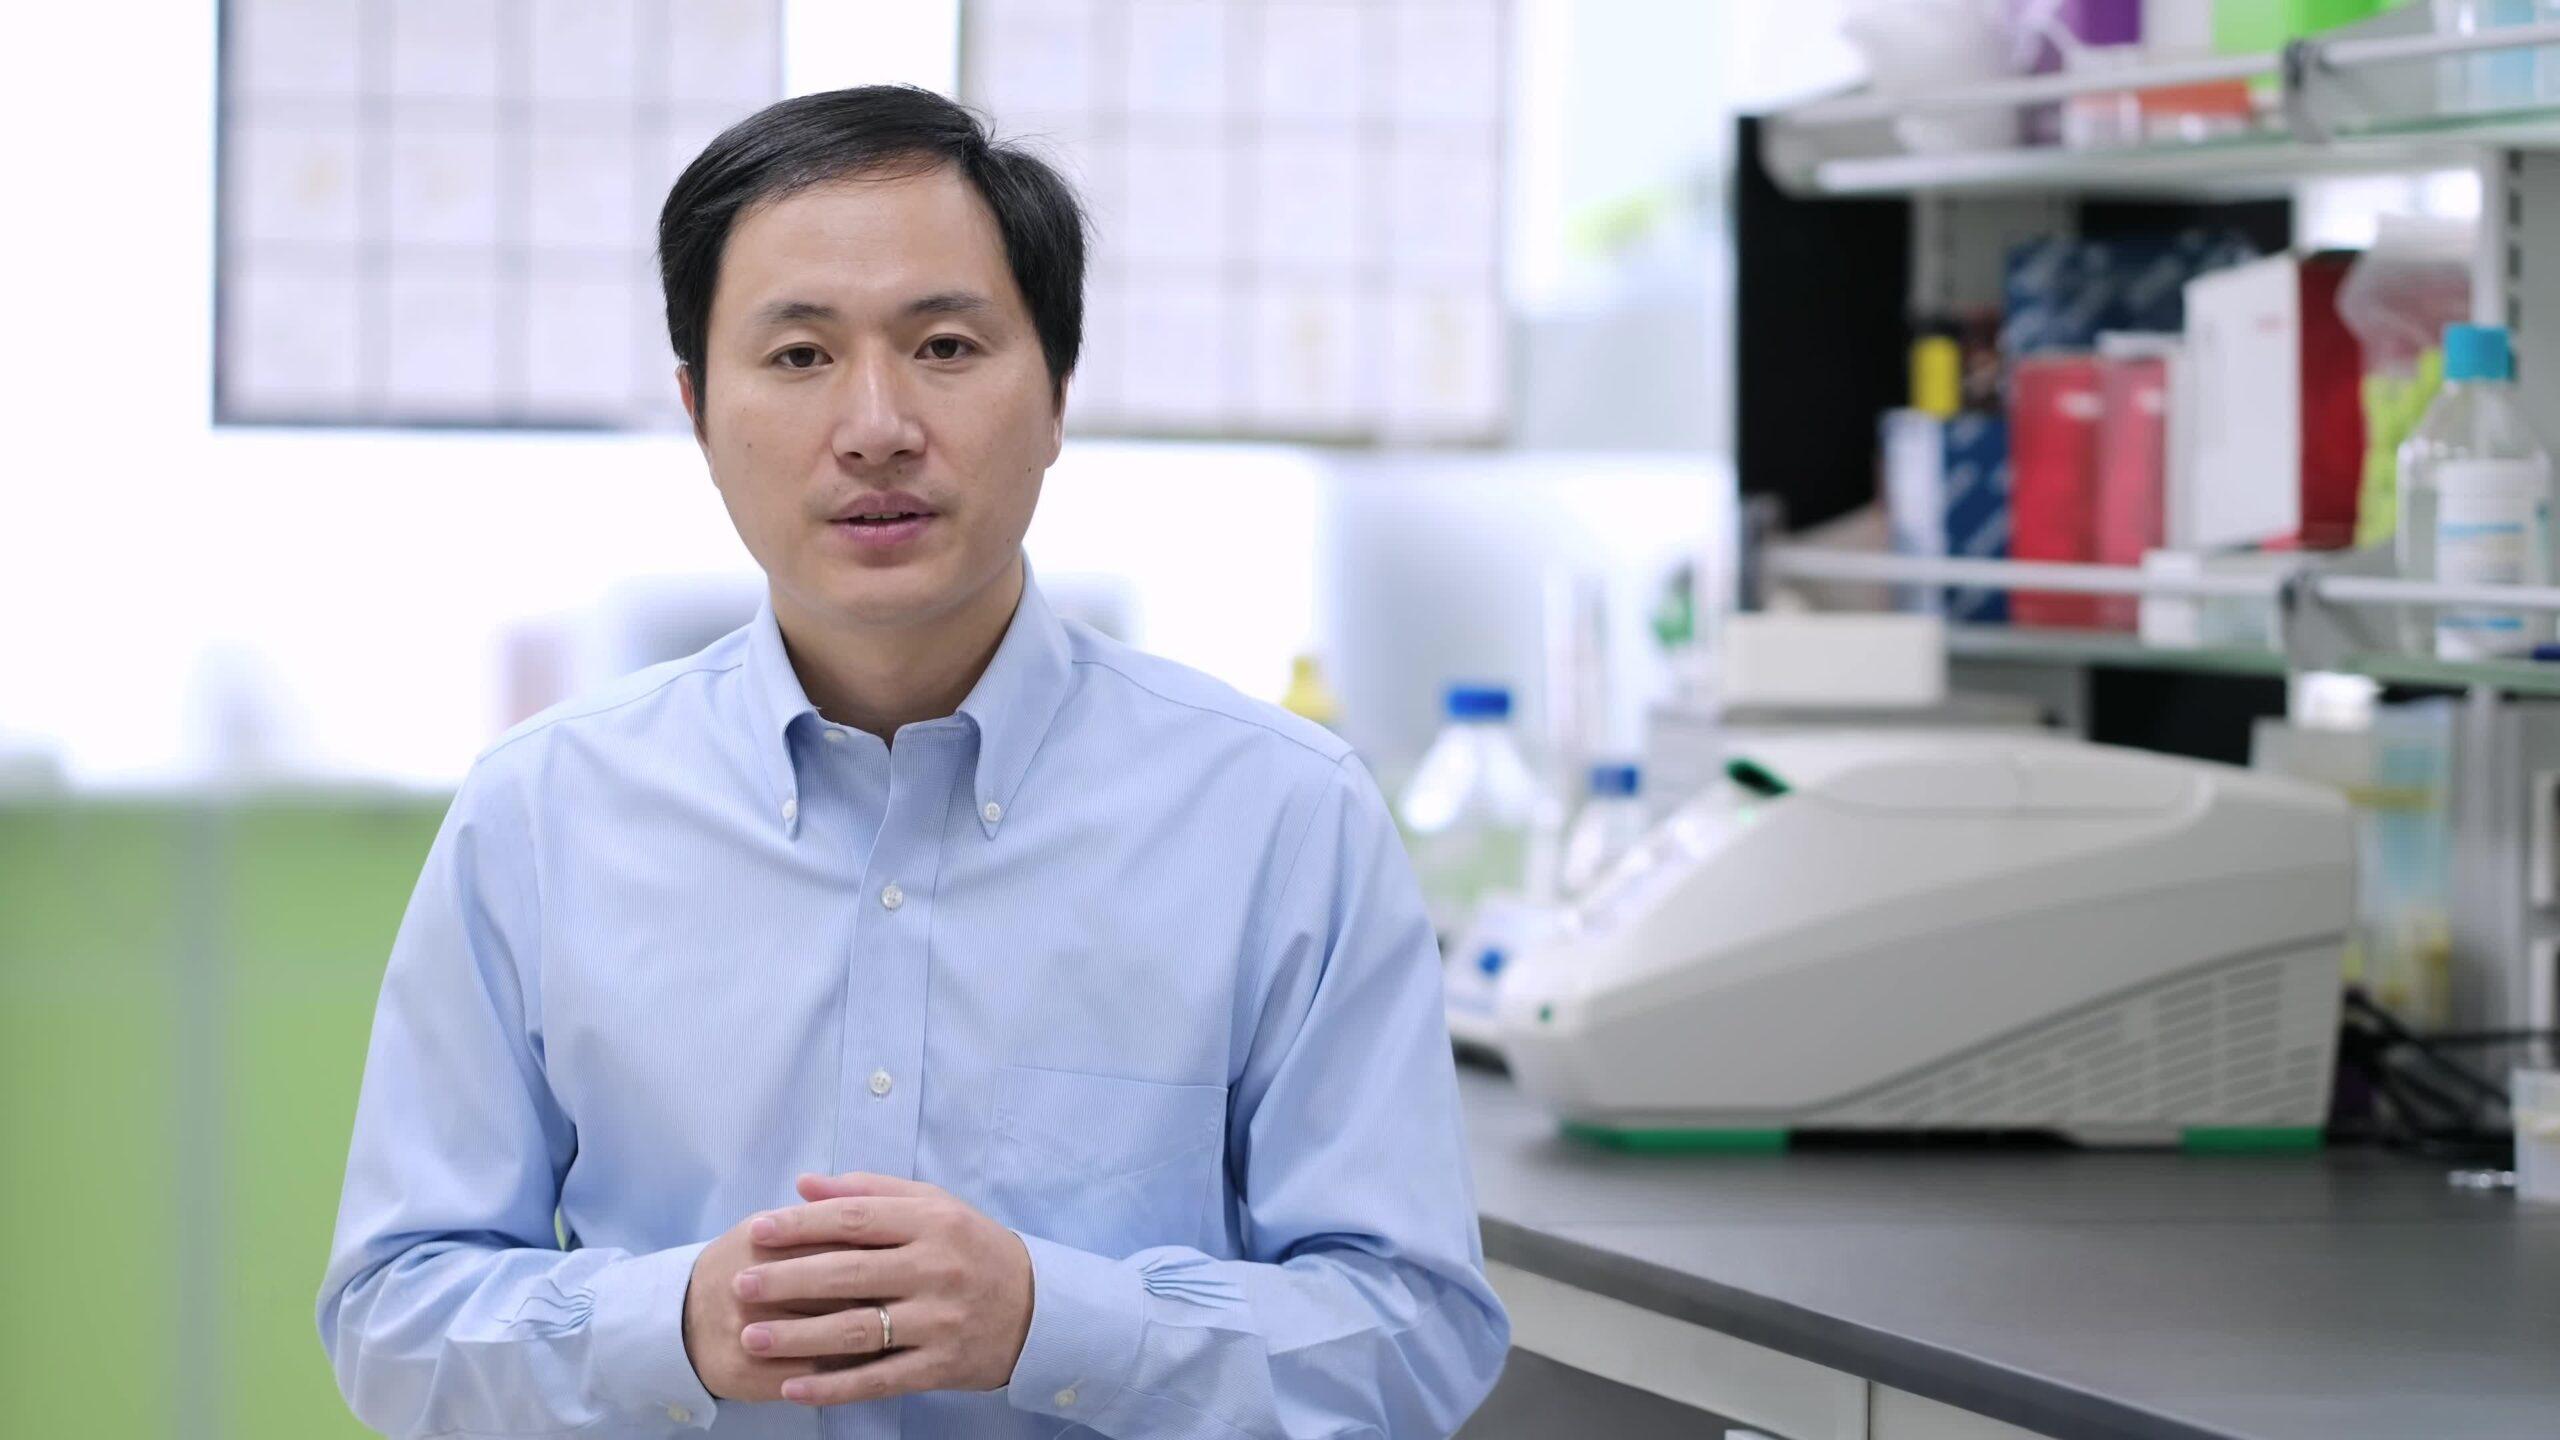 Condenan a científico chino por modificar genéticamente a bebés